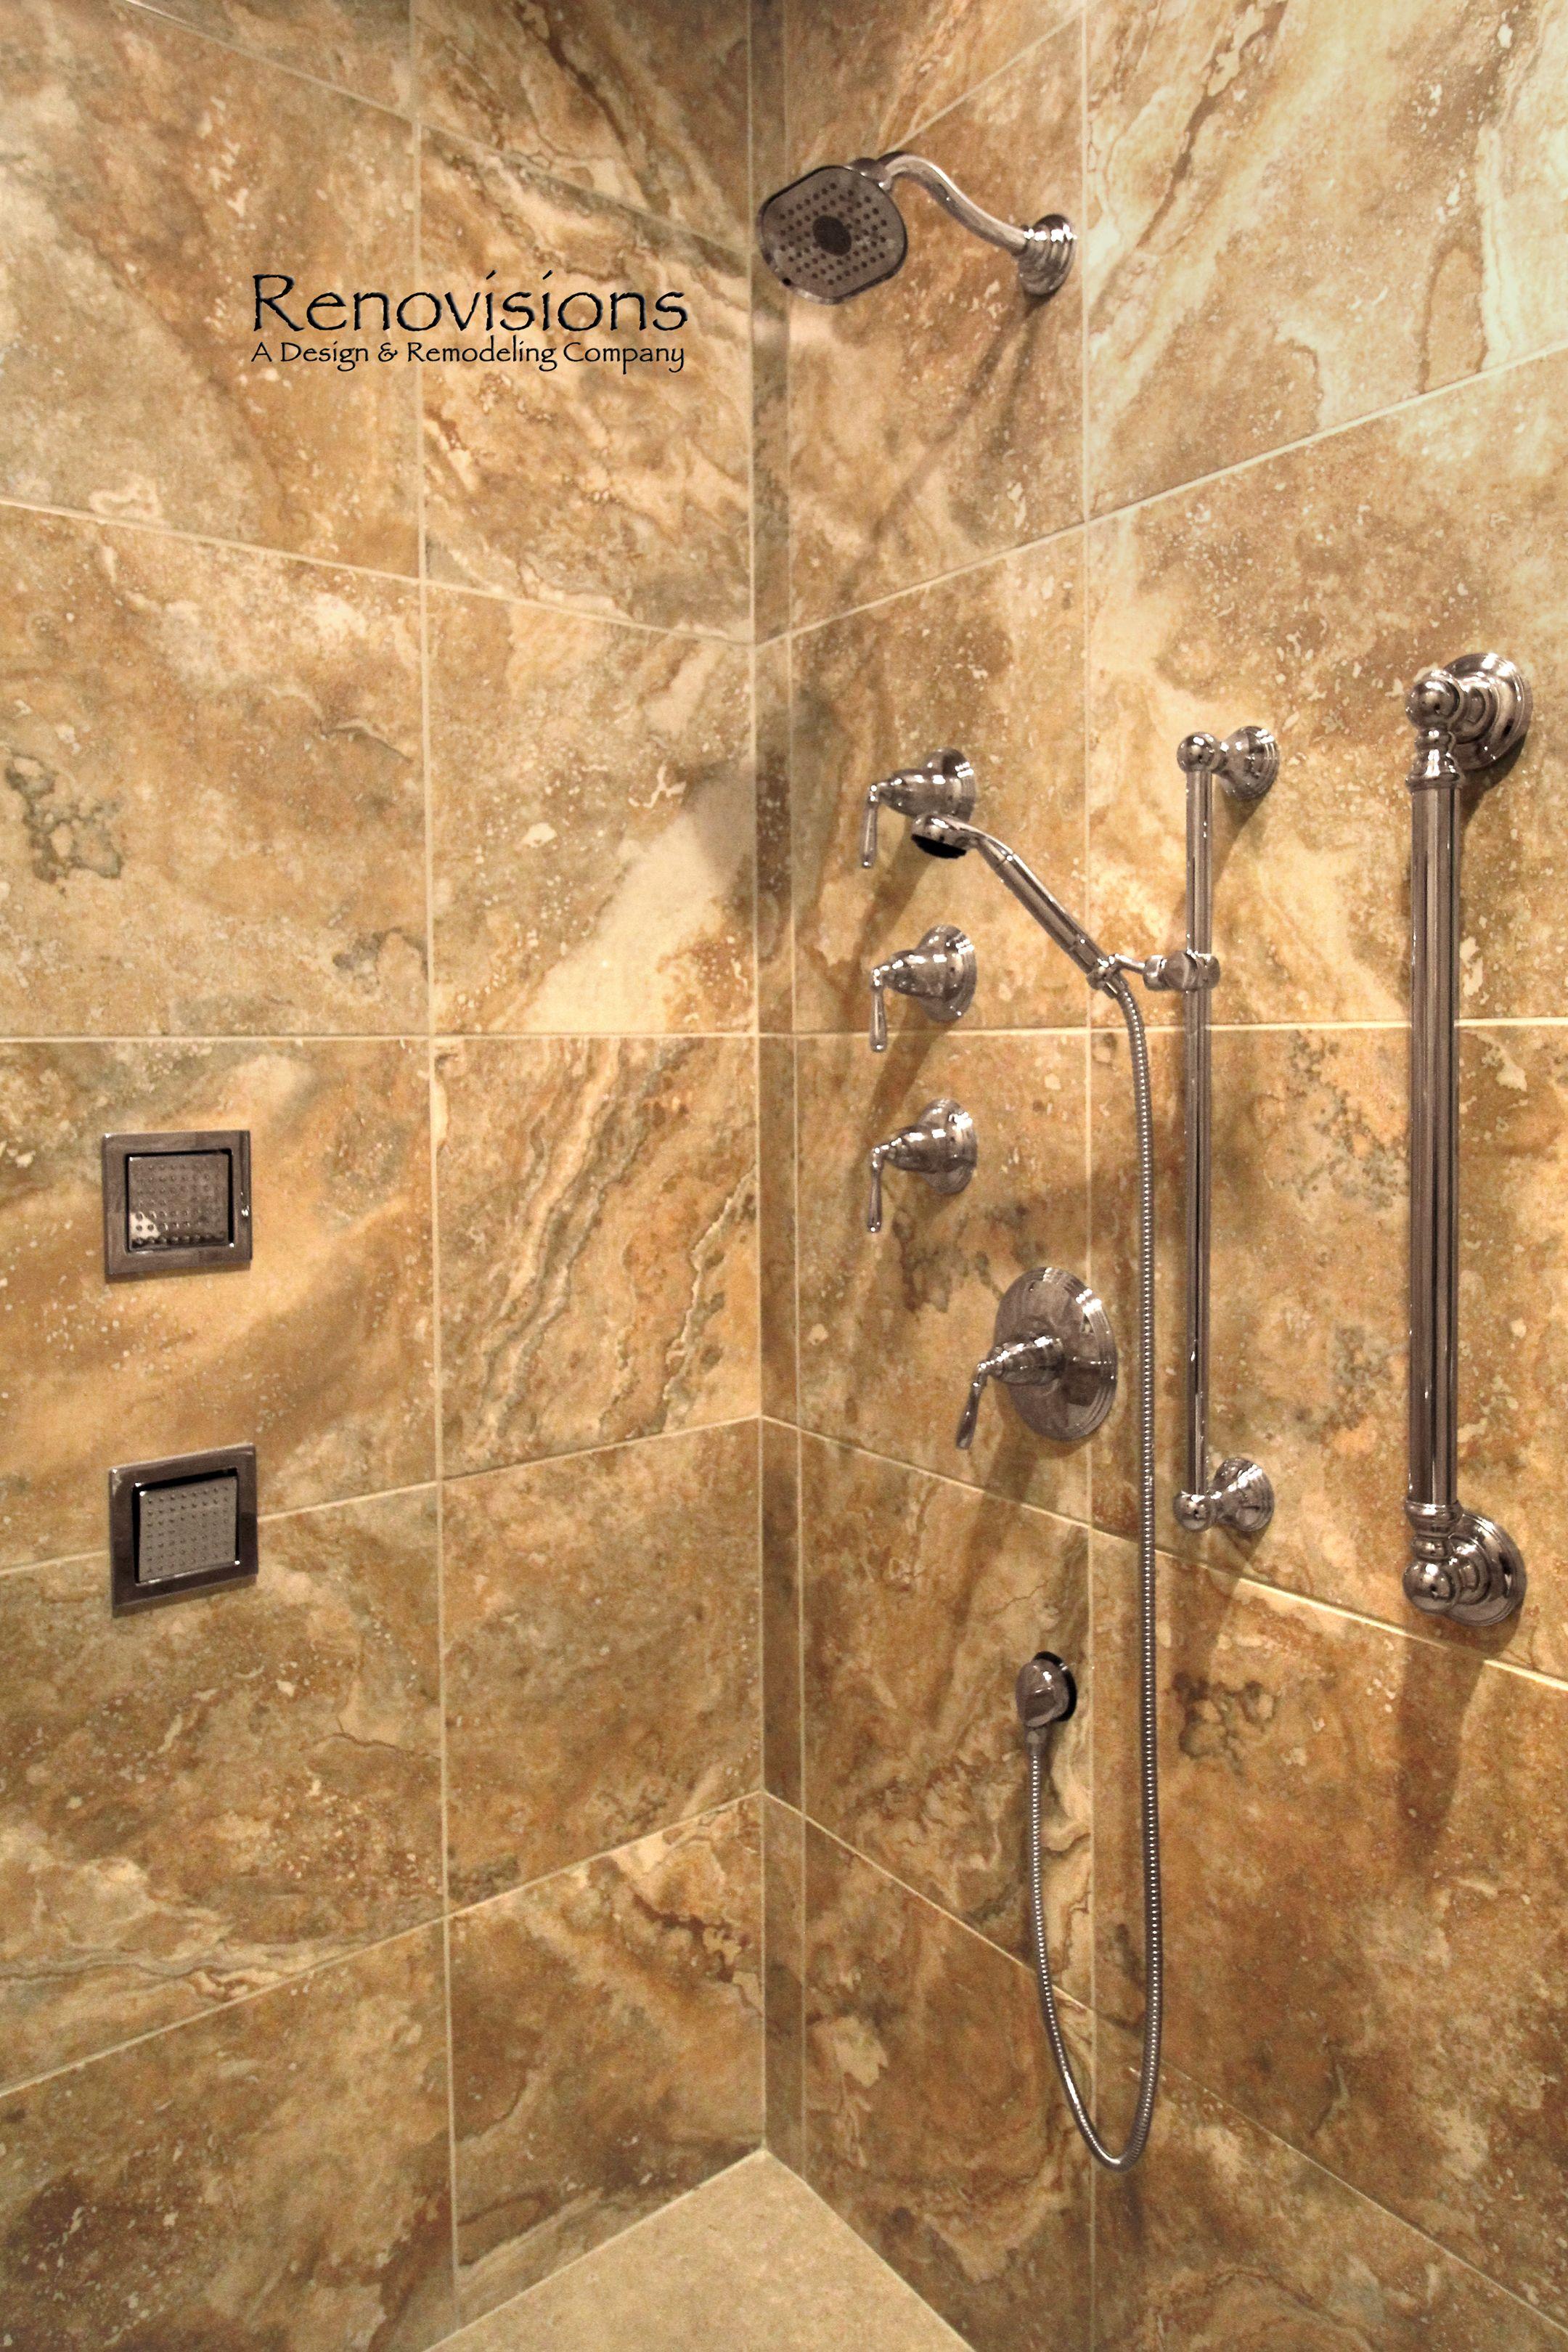 Master Bathroom Remodel By Renovisions